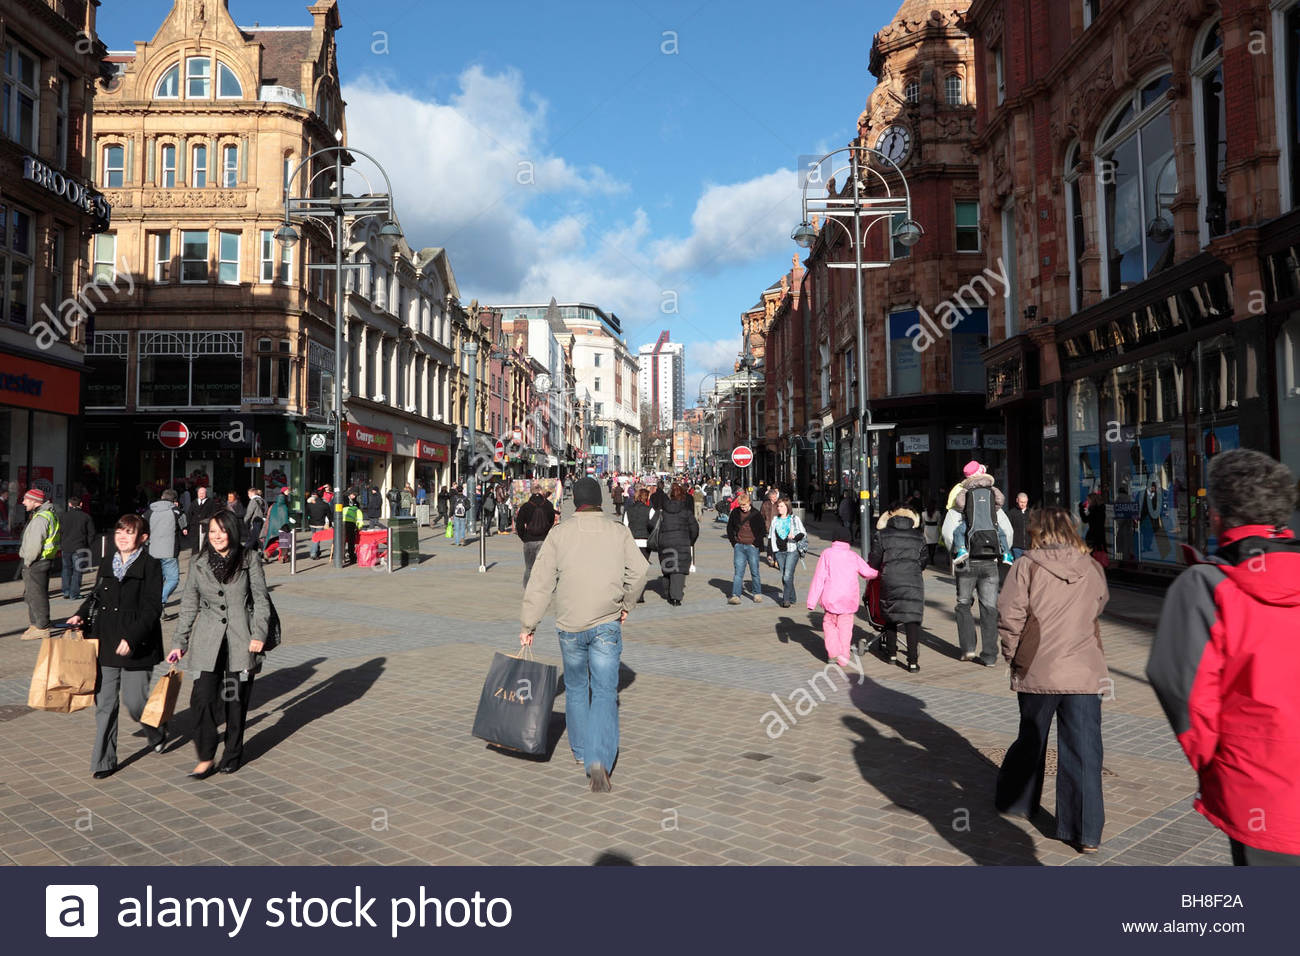 Briggate Leeds West Yorkshire England - Stock Image